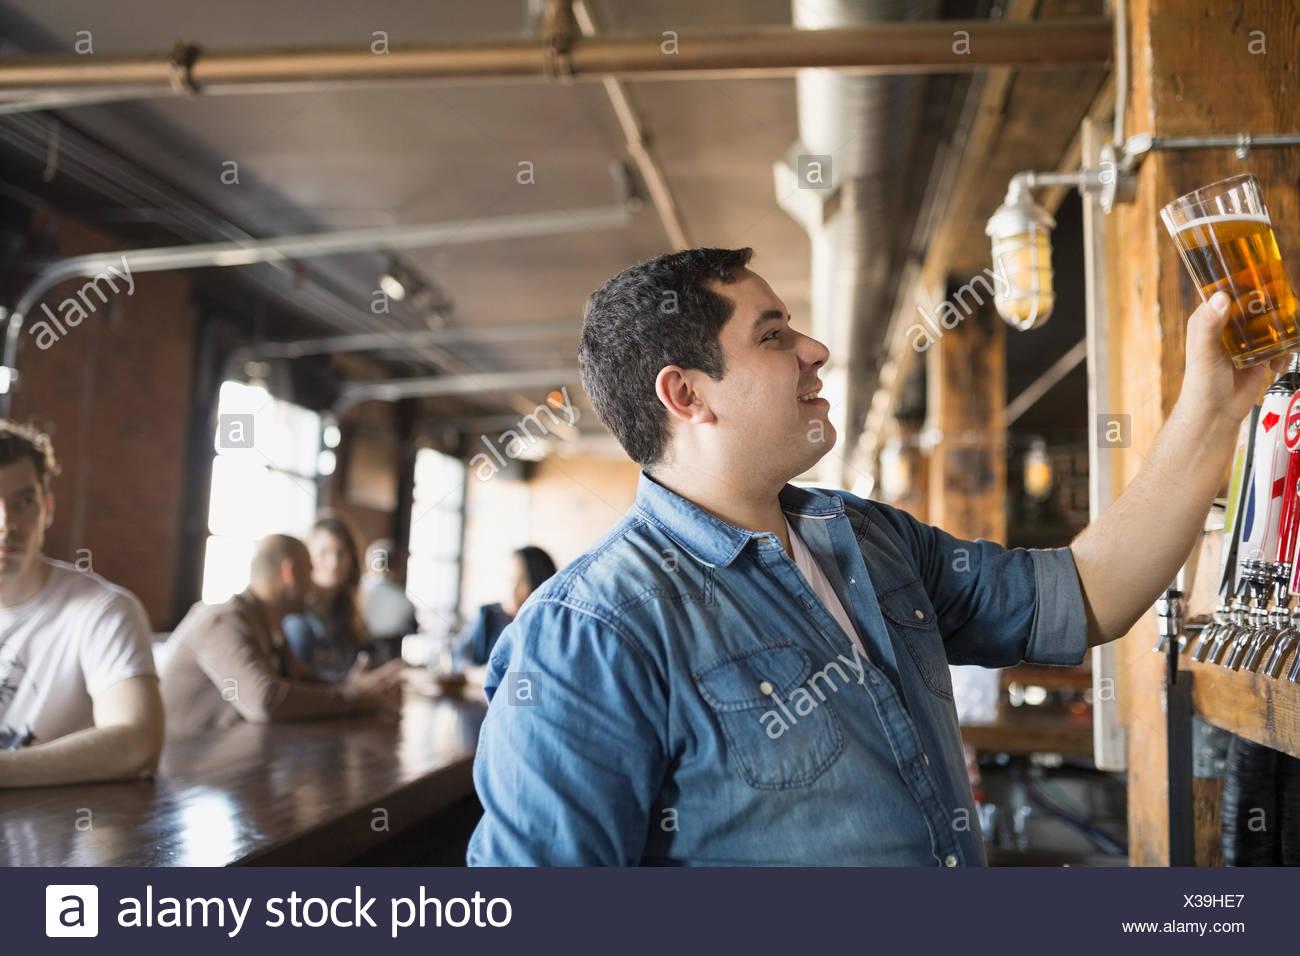 Bartender eyeing pint of beer - Stock Image